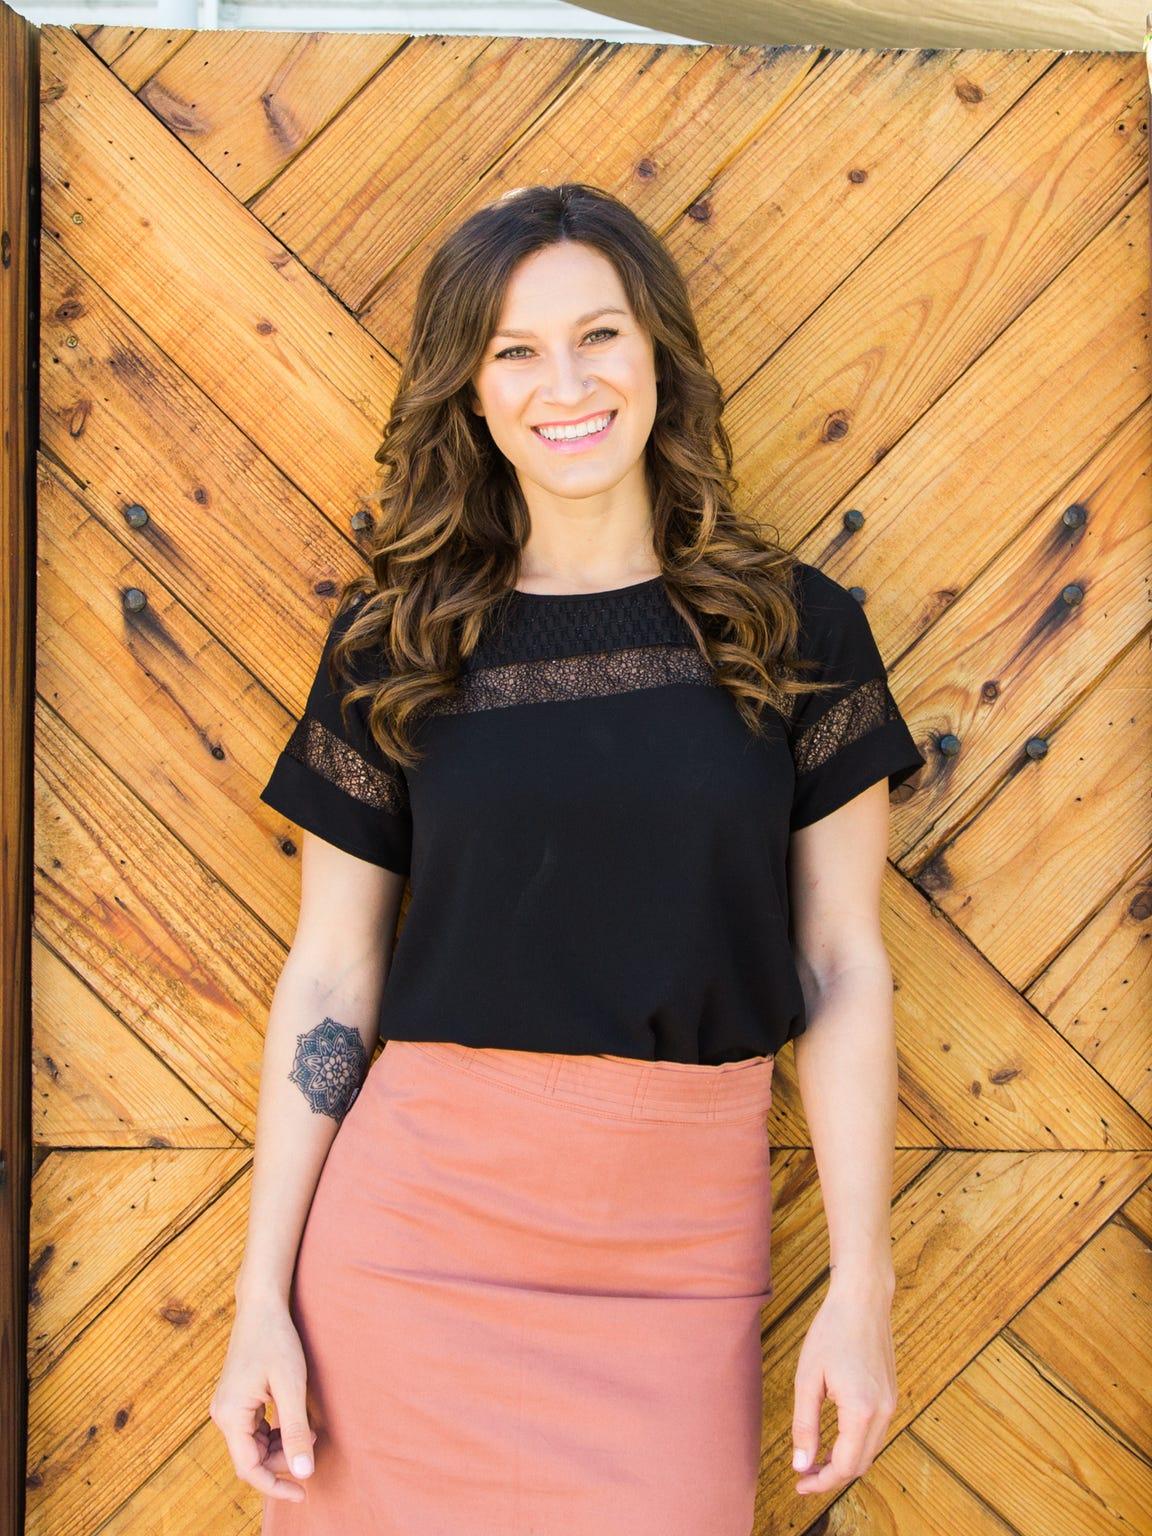 Kristin Scharkey, Editor